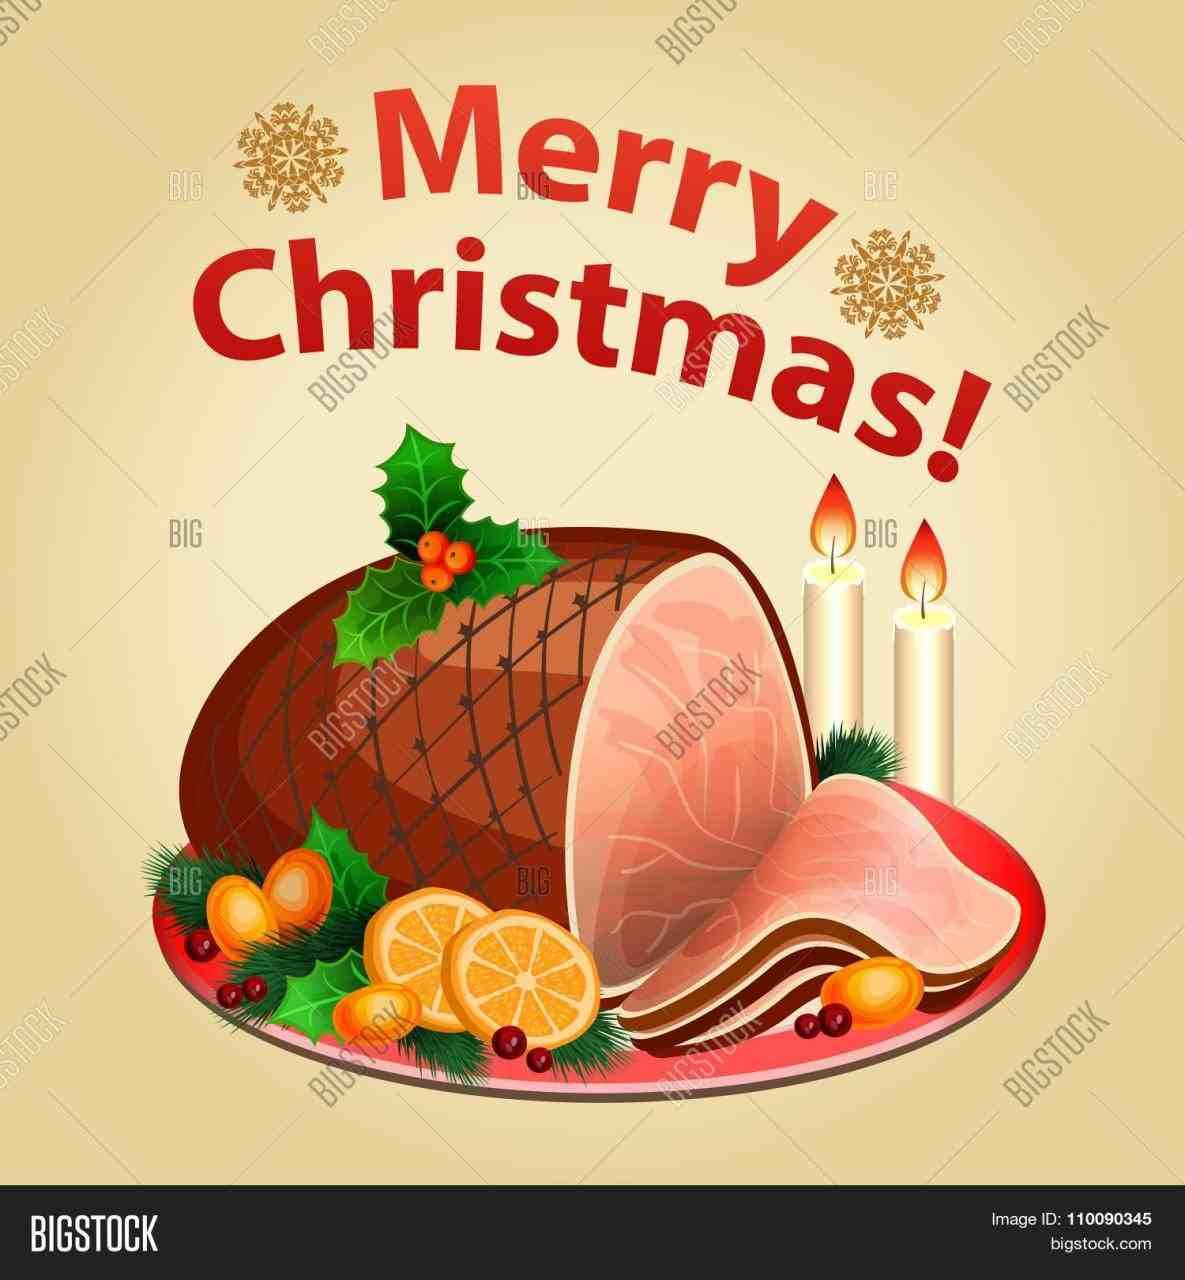 Ham clipart holiday ham. Christmas food clip art